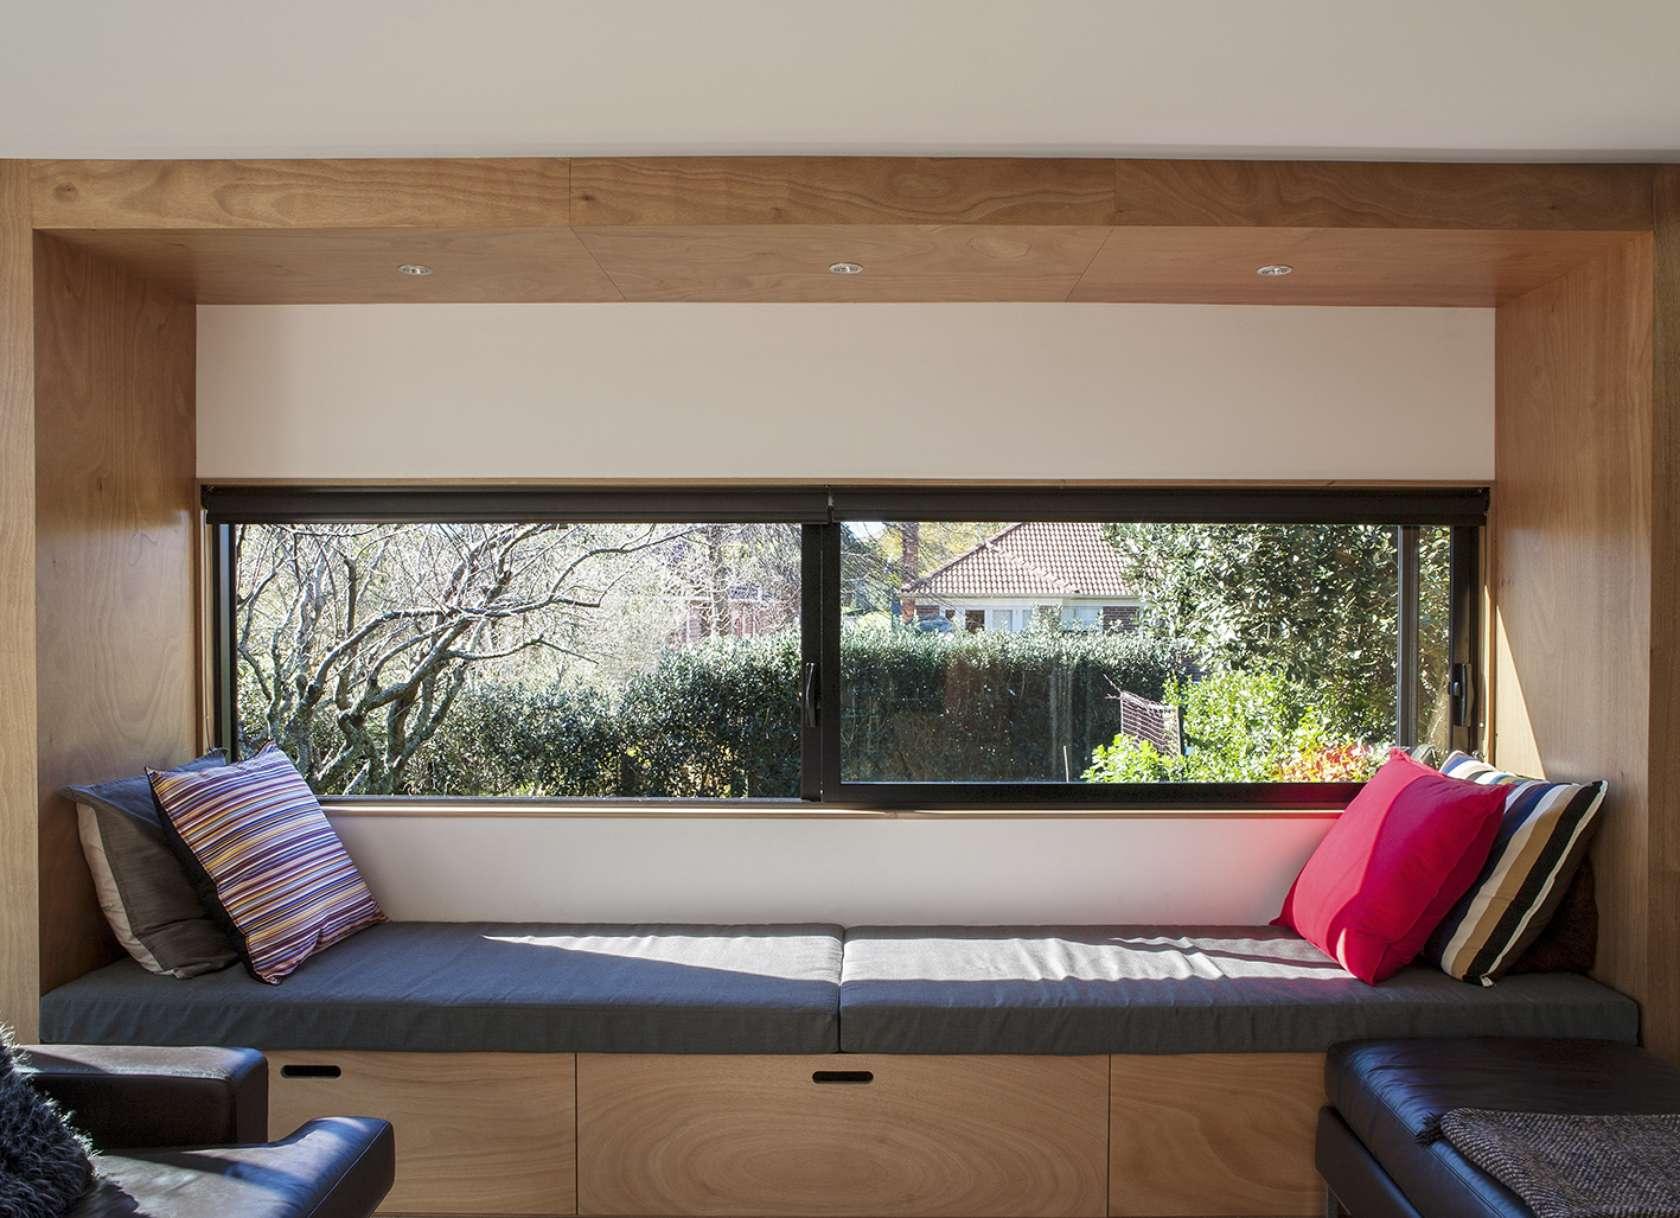 Westmere Park Avenue by Dorrington Atcheson Architects (via Lunchbox Architect)